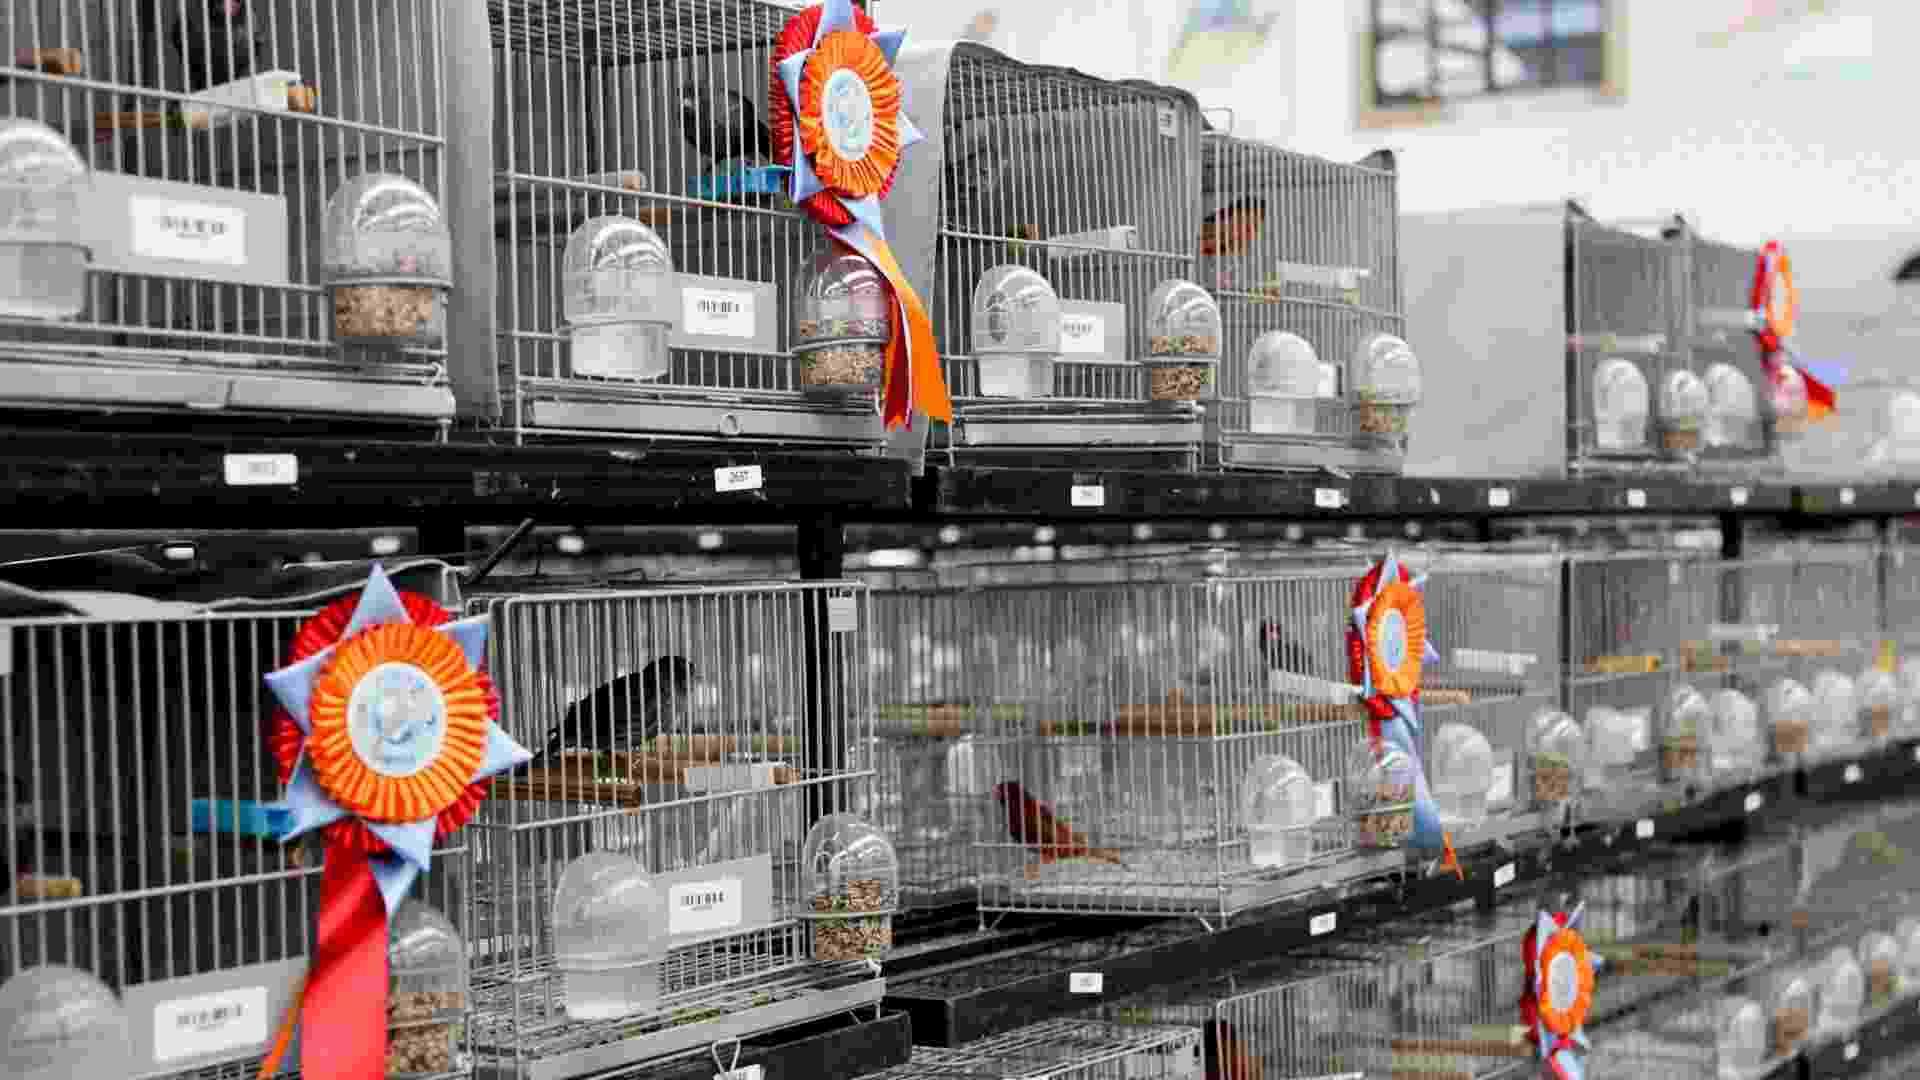 19.jul.2012 - Campeonato Mundial reúne diversas espécies de pássaros em Itatiba (SP) - Fernando Donasci/UOL